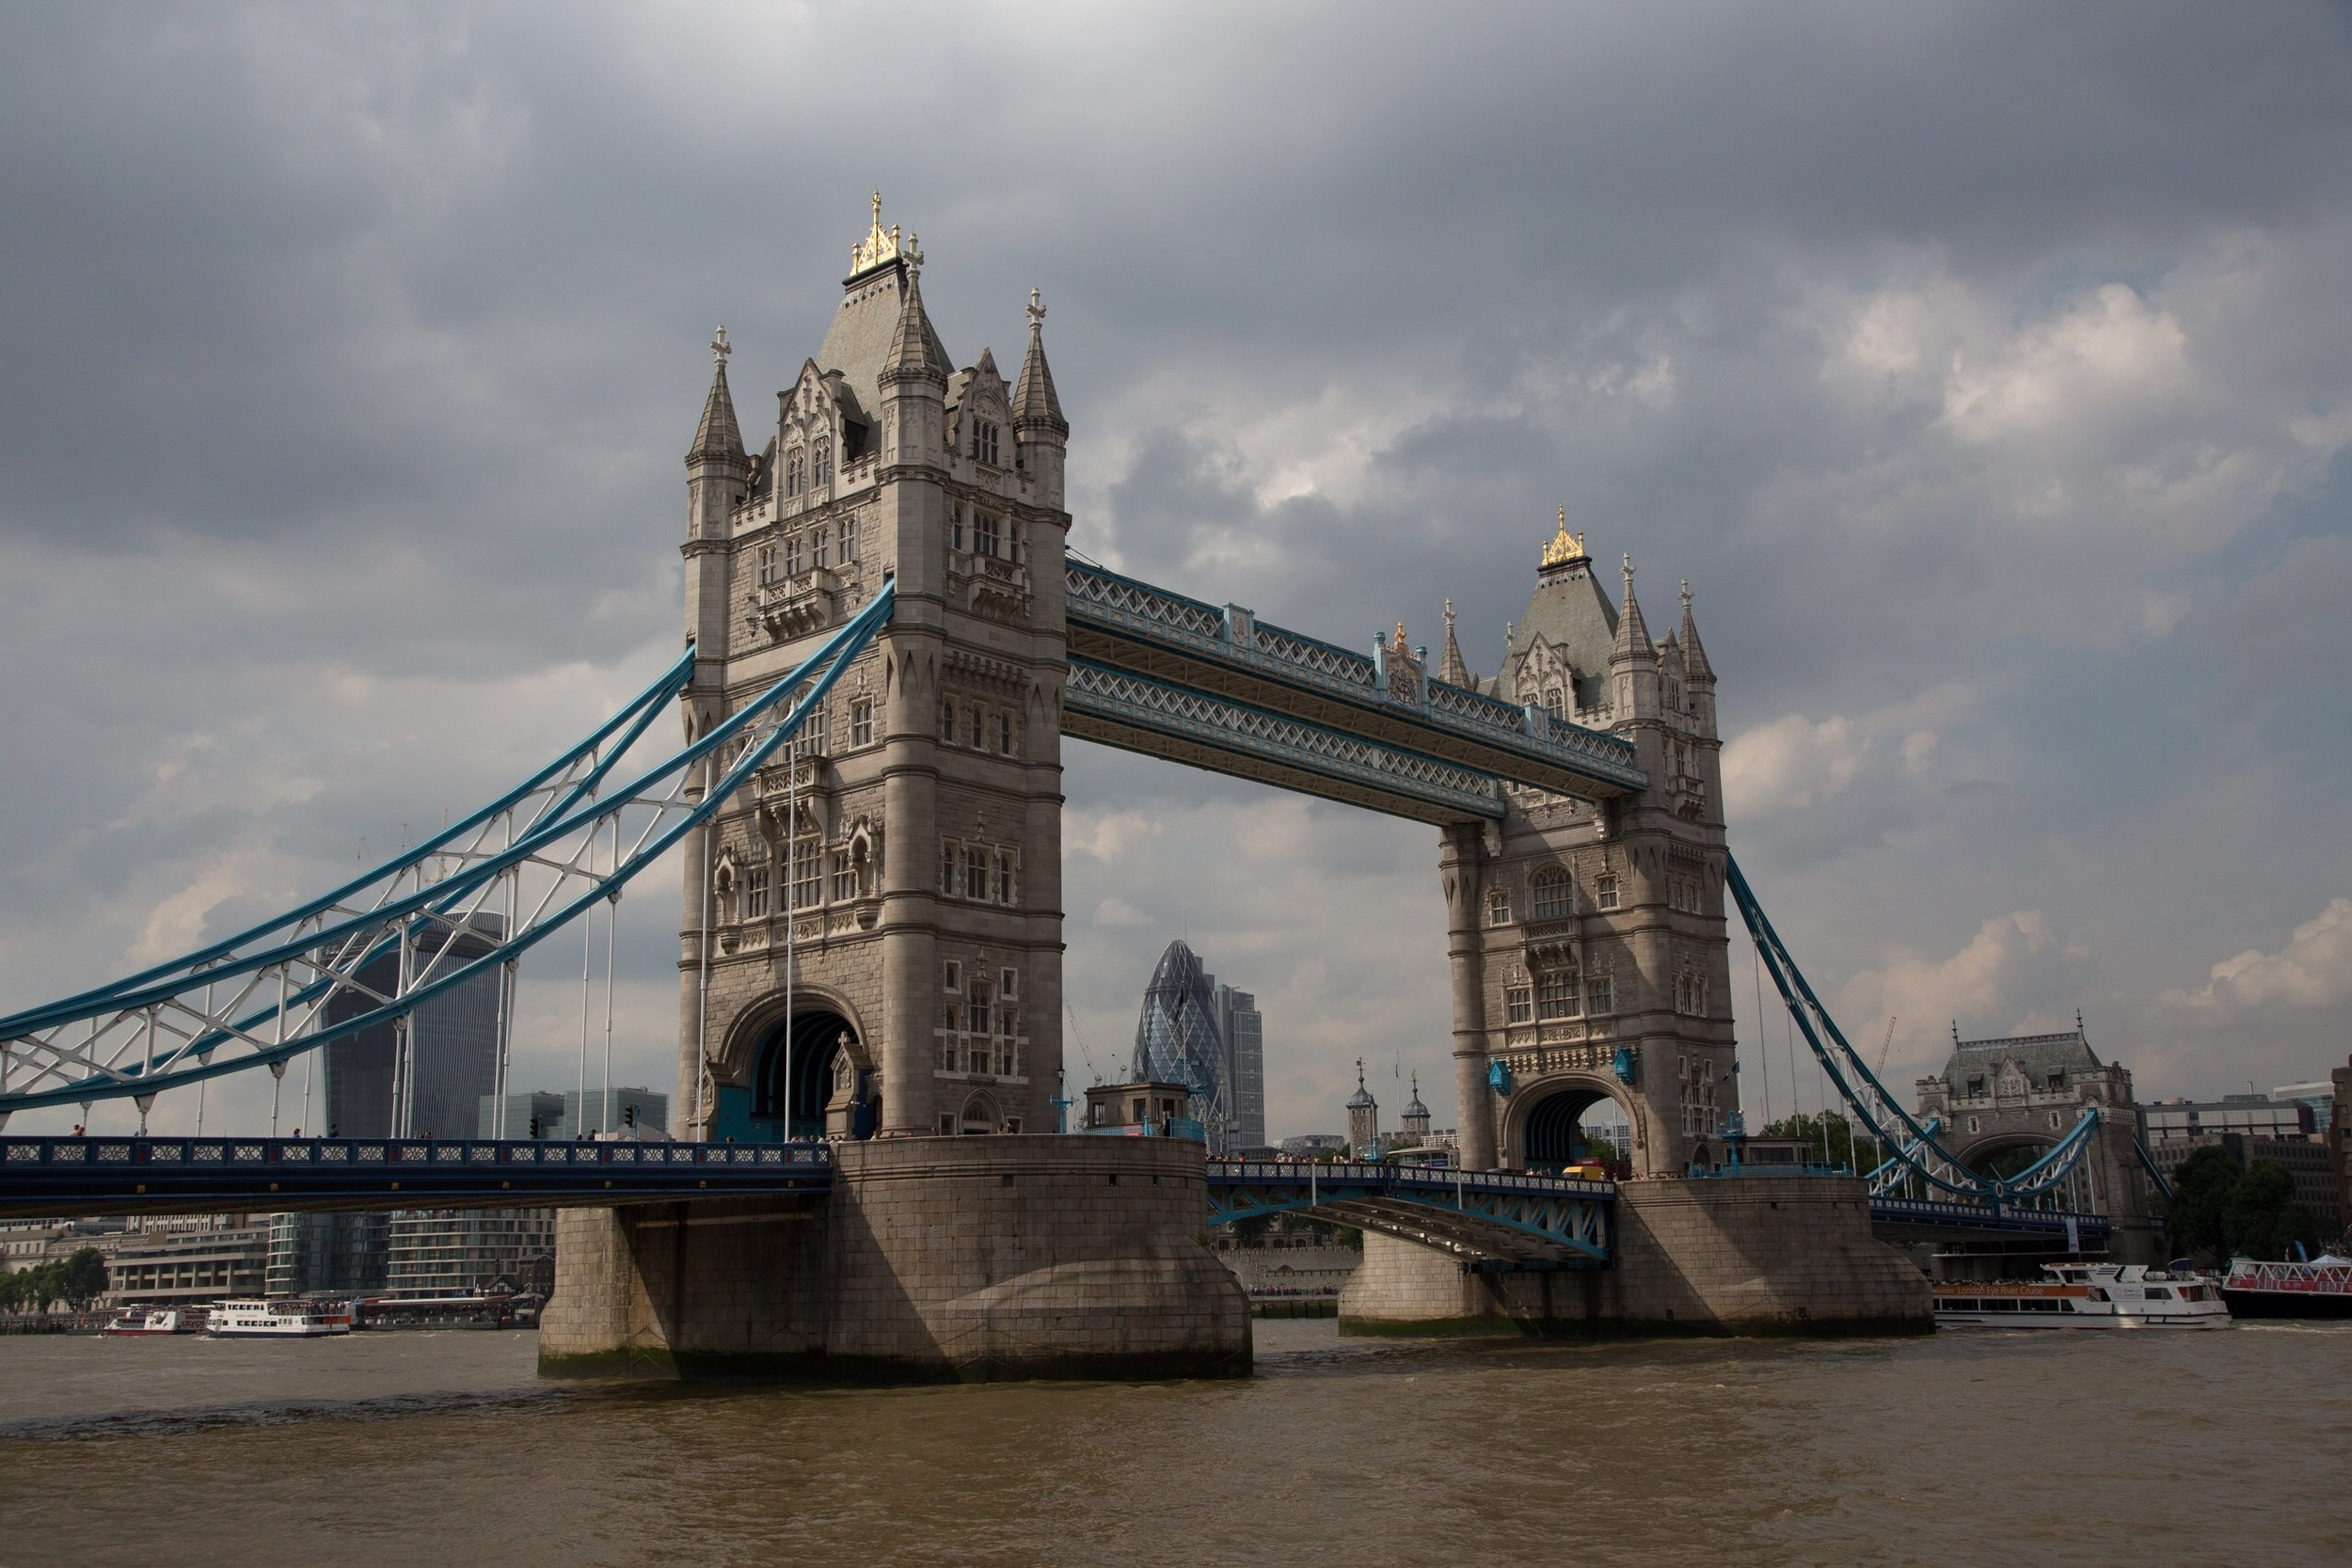 Tower Bridge by Rick McEvoy architectural photographer